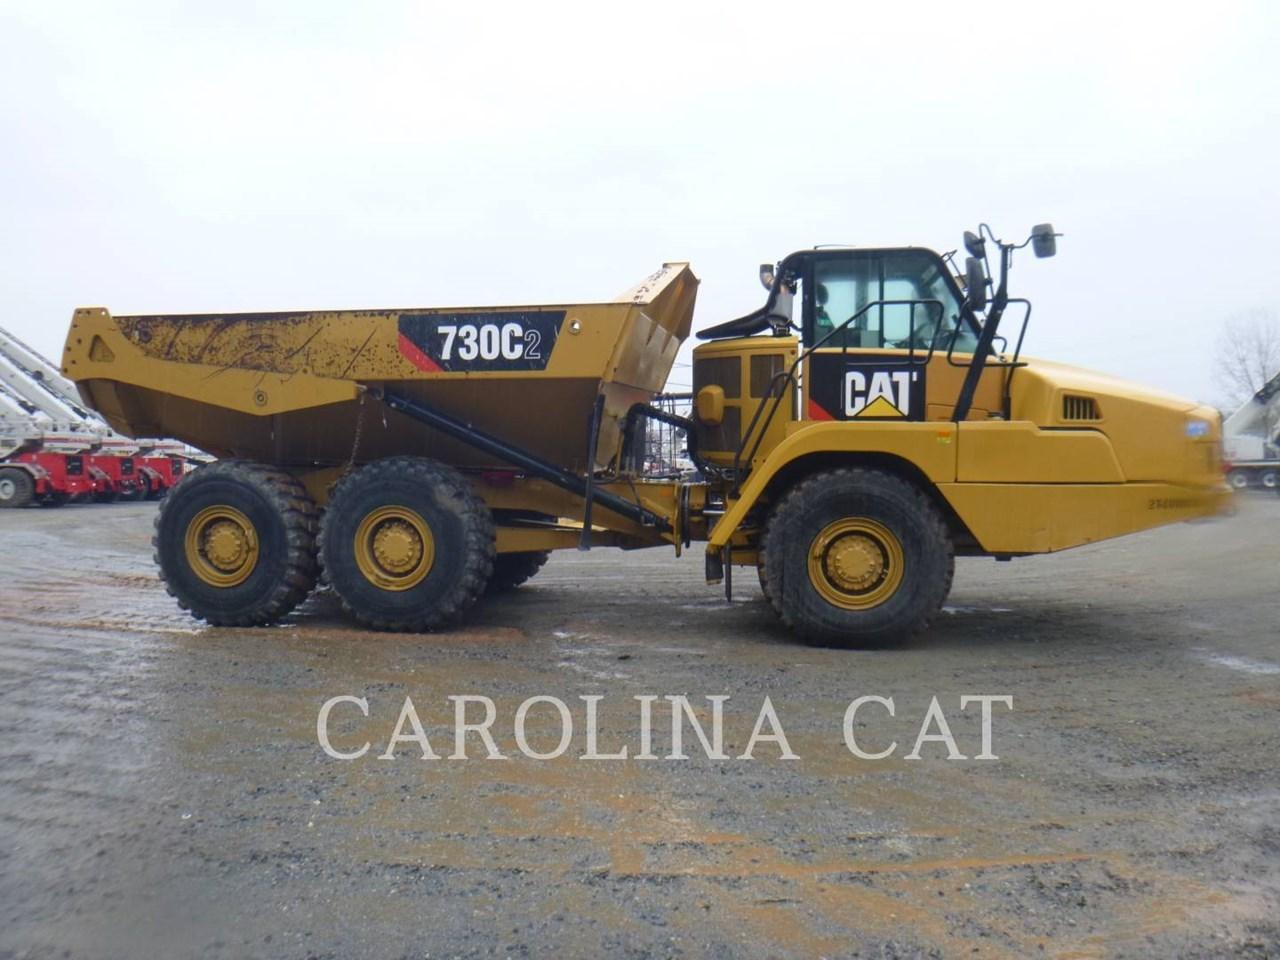 2018 Caterpillar 730C2 TG Image 9